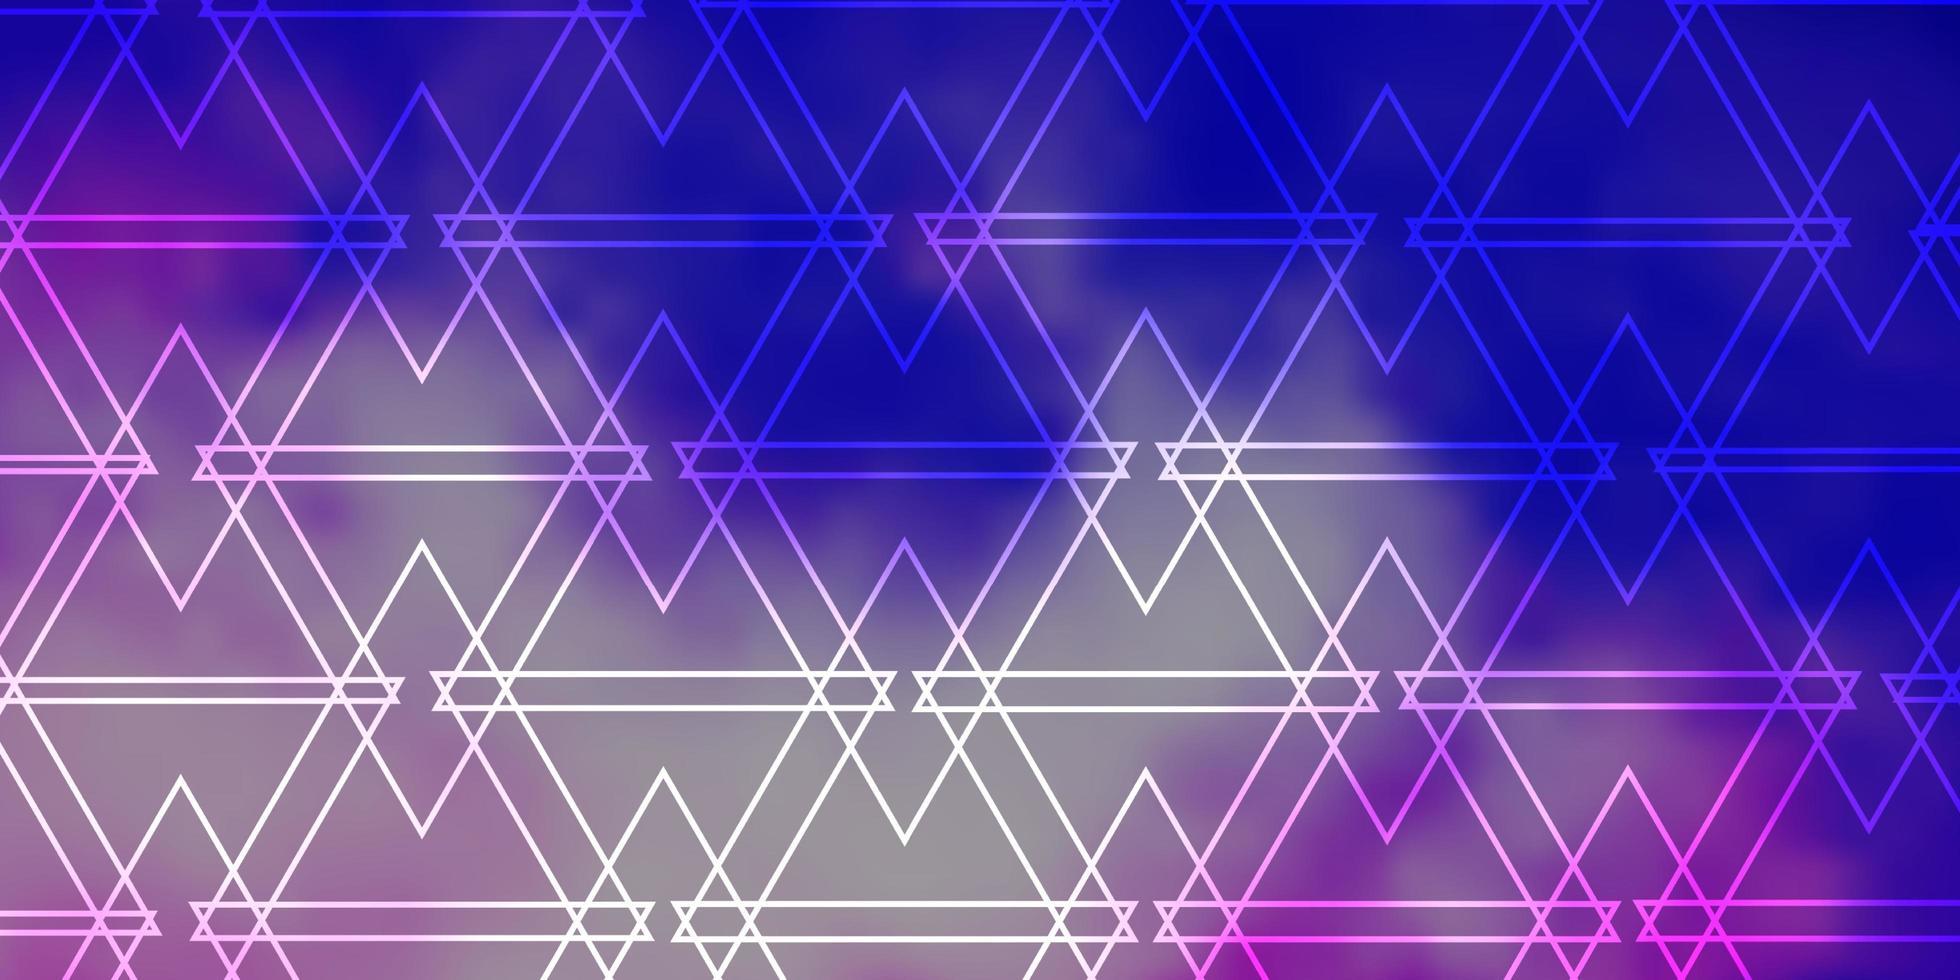 fundo vector roxo claro com triângulos.